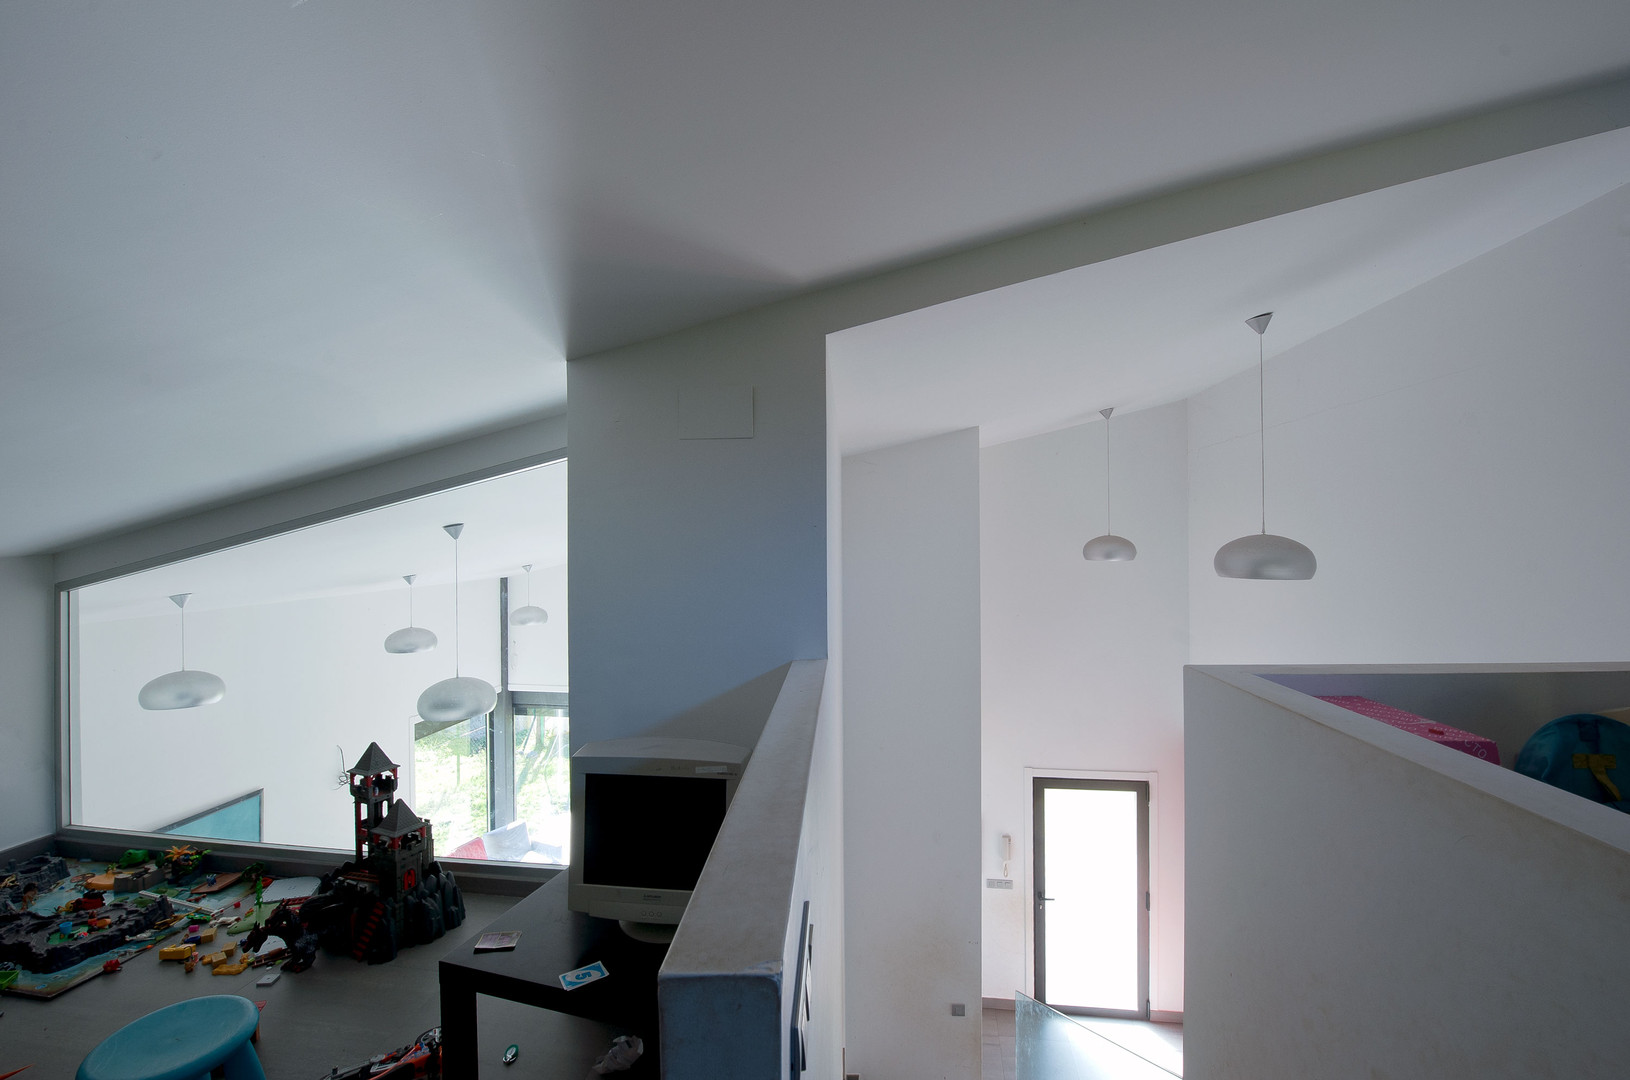 arquitectura-senmais-06.23.11.jpg